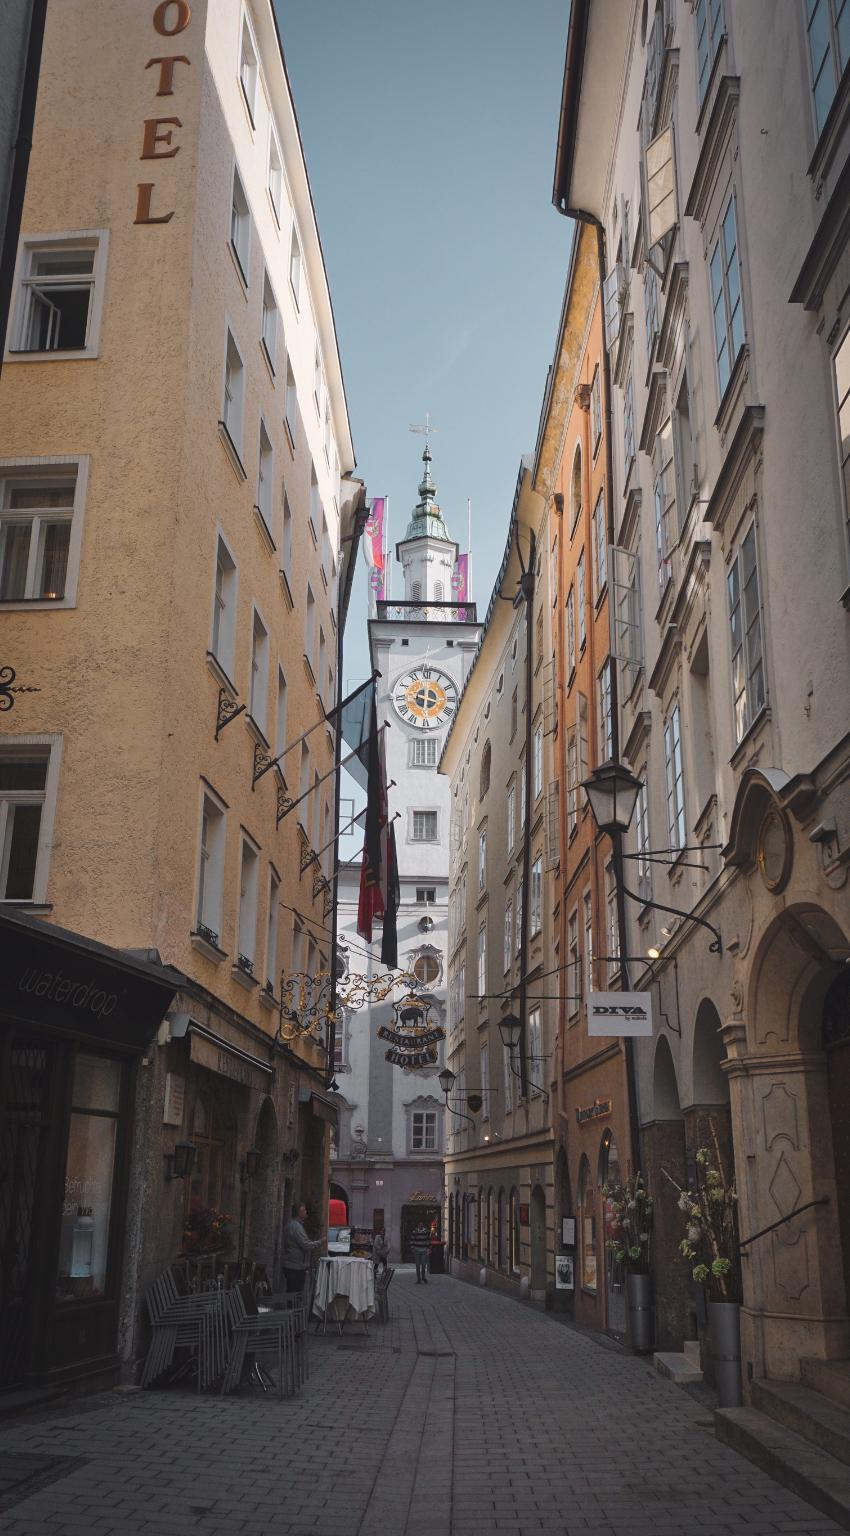 Altstadt - Old Town, Salzburg